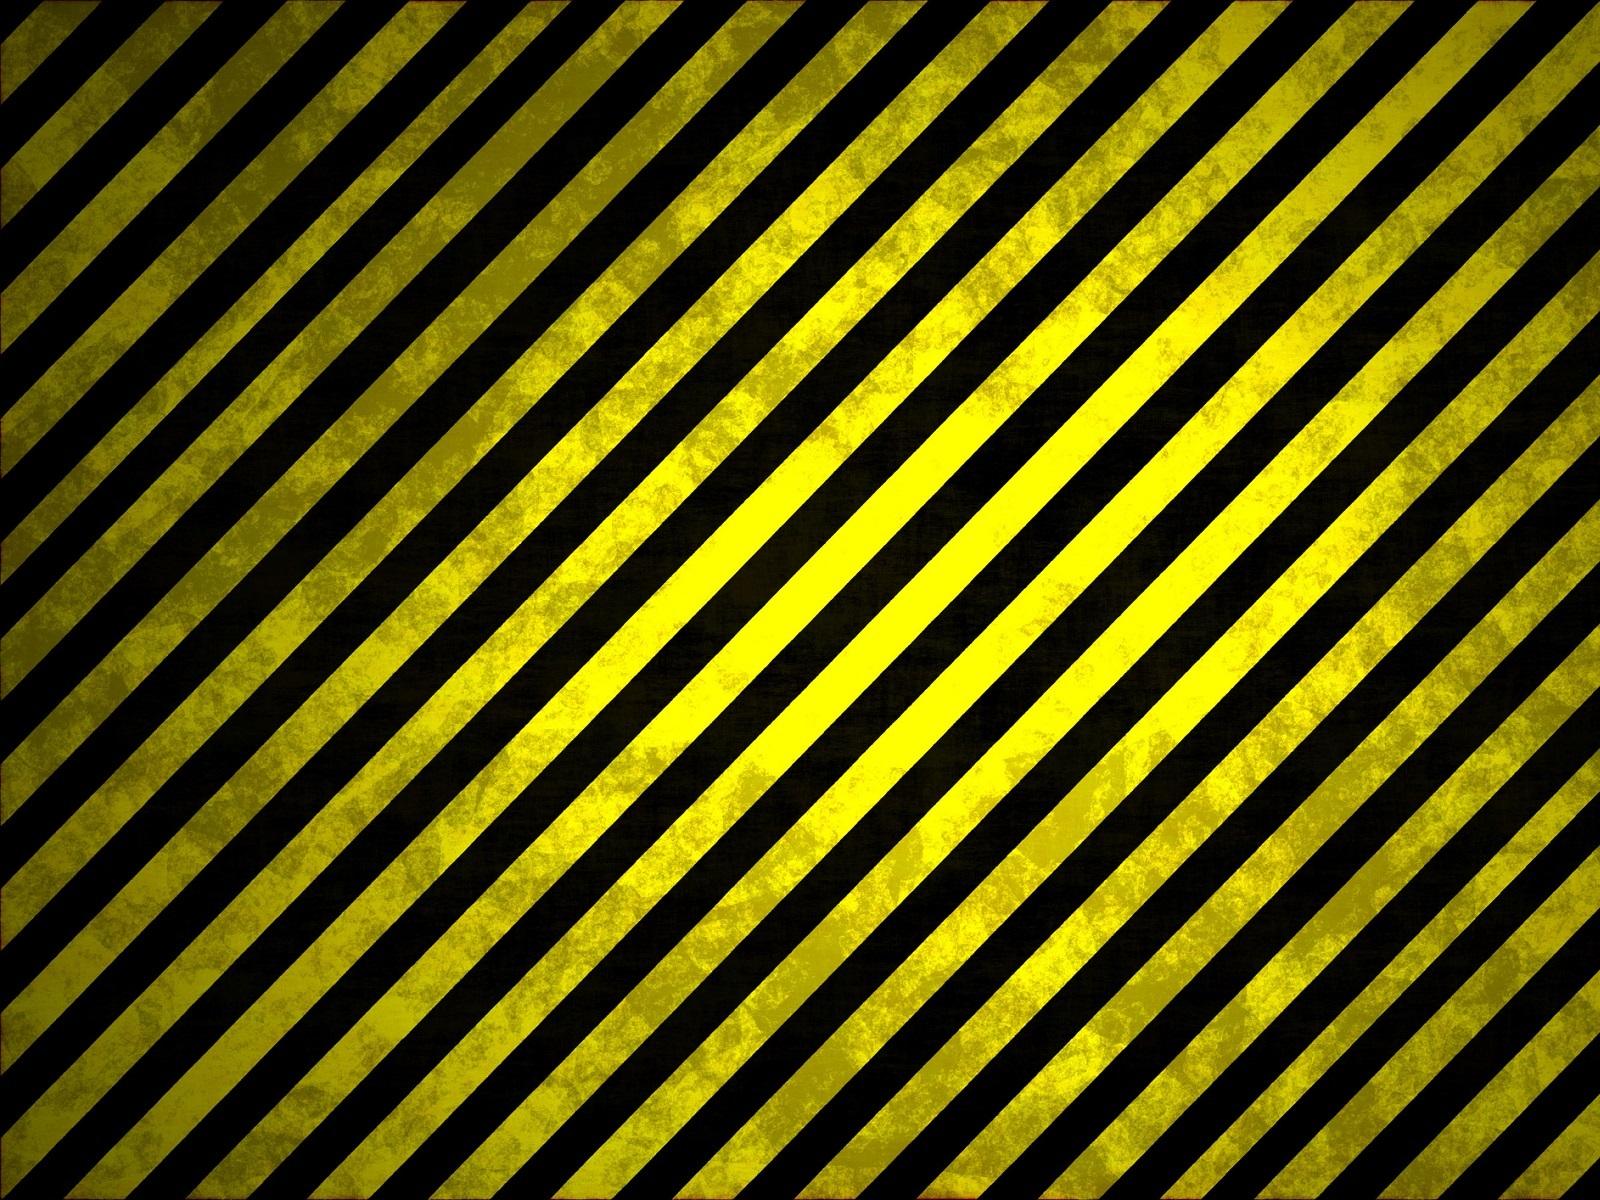 Handling Non-Hazardous and Hazardous Drugs